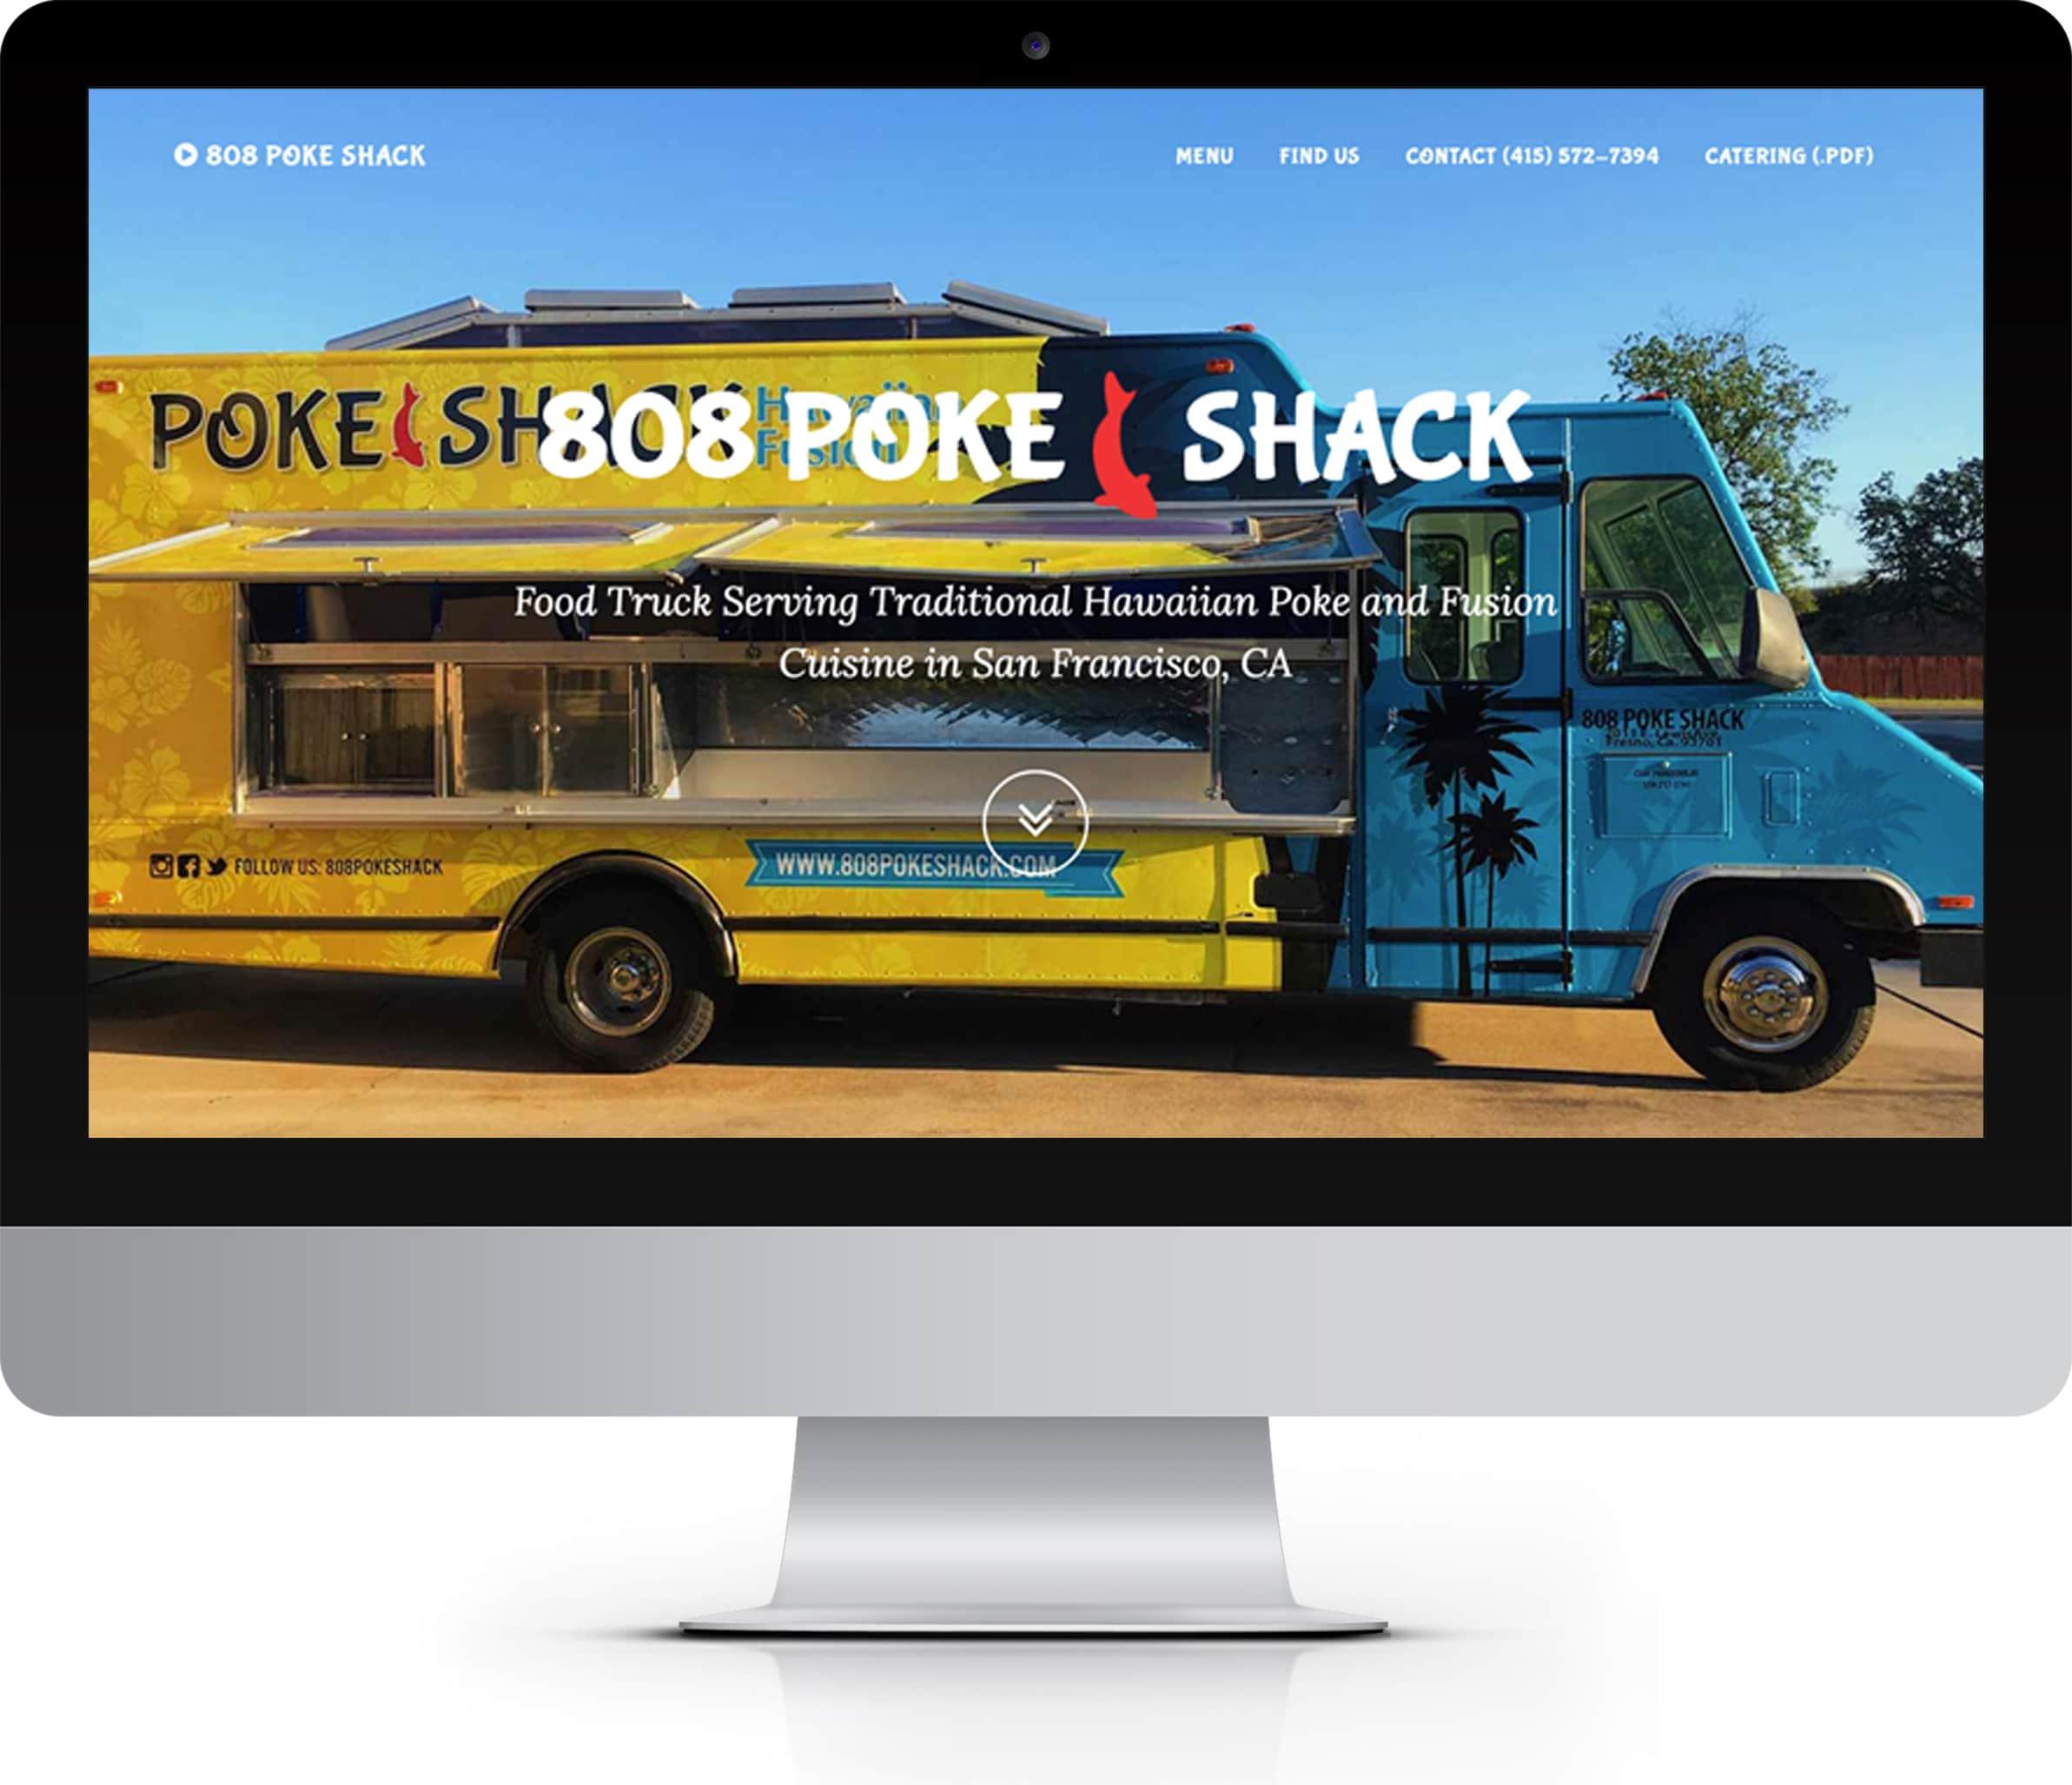 808 Poke Shack 1